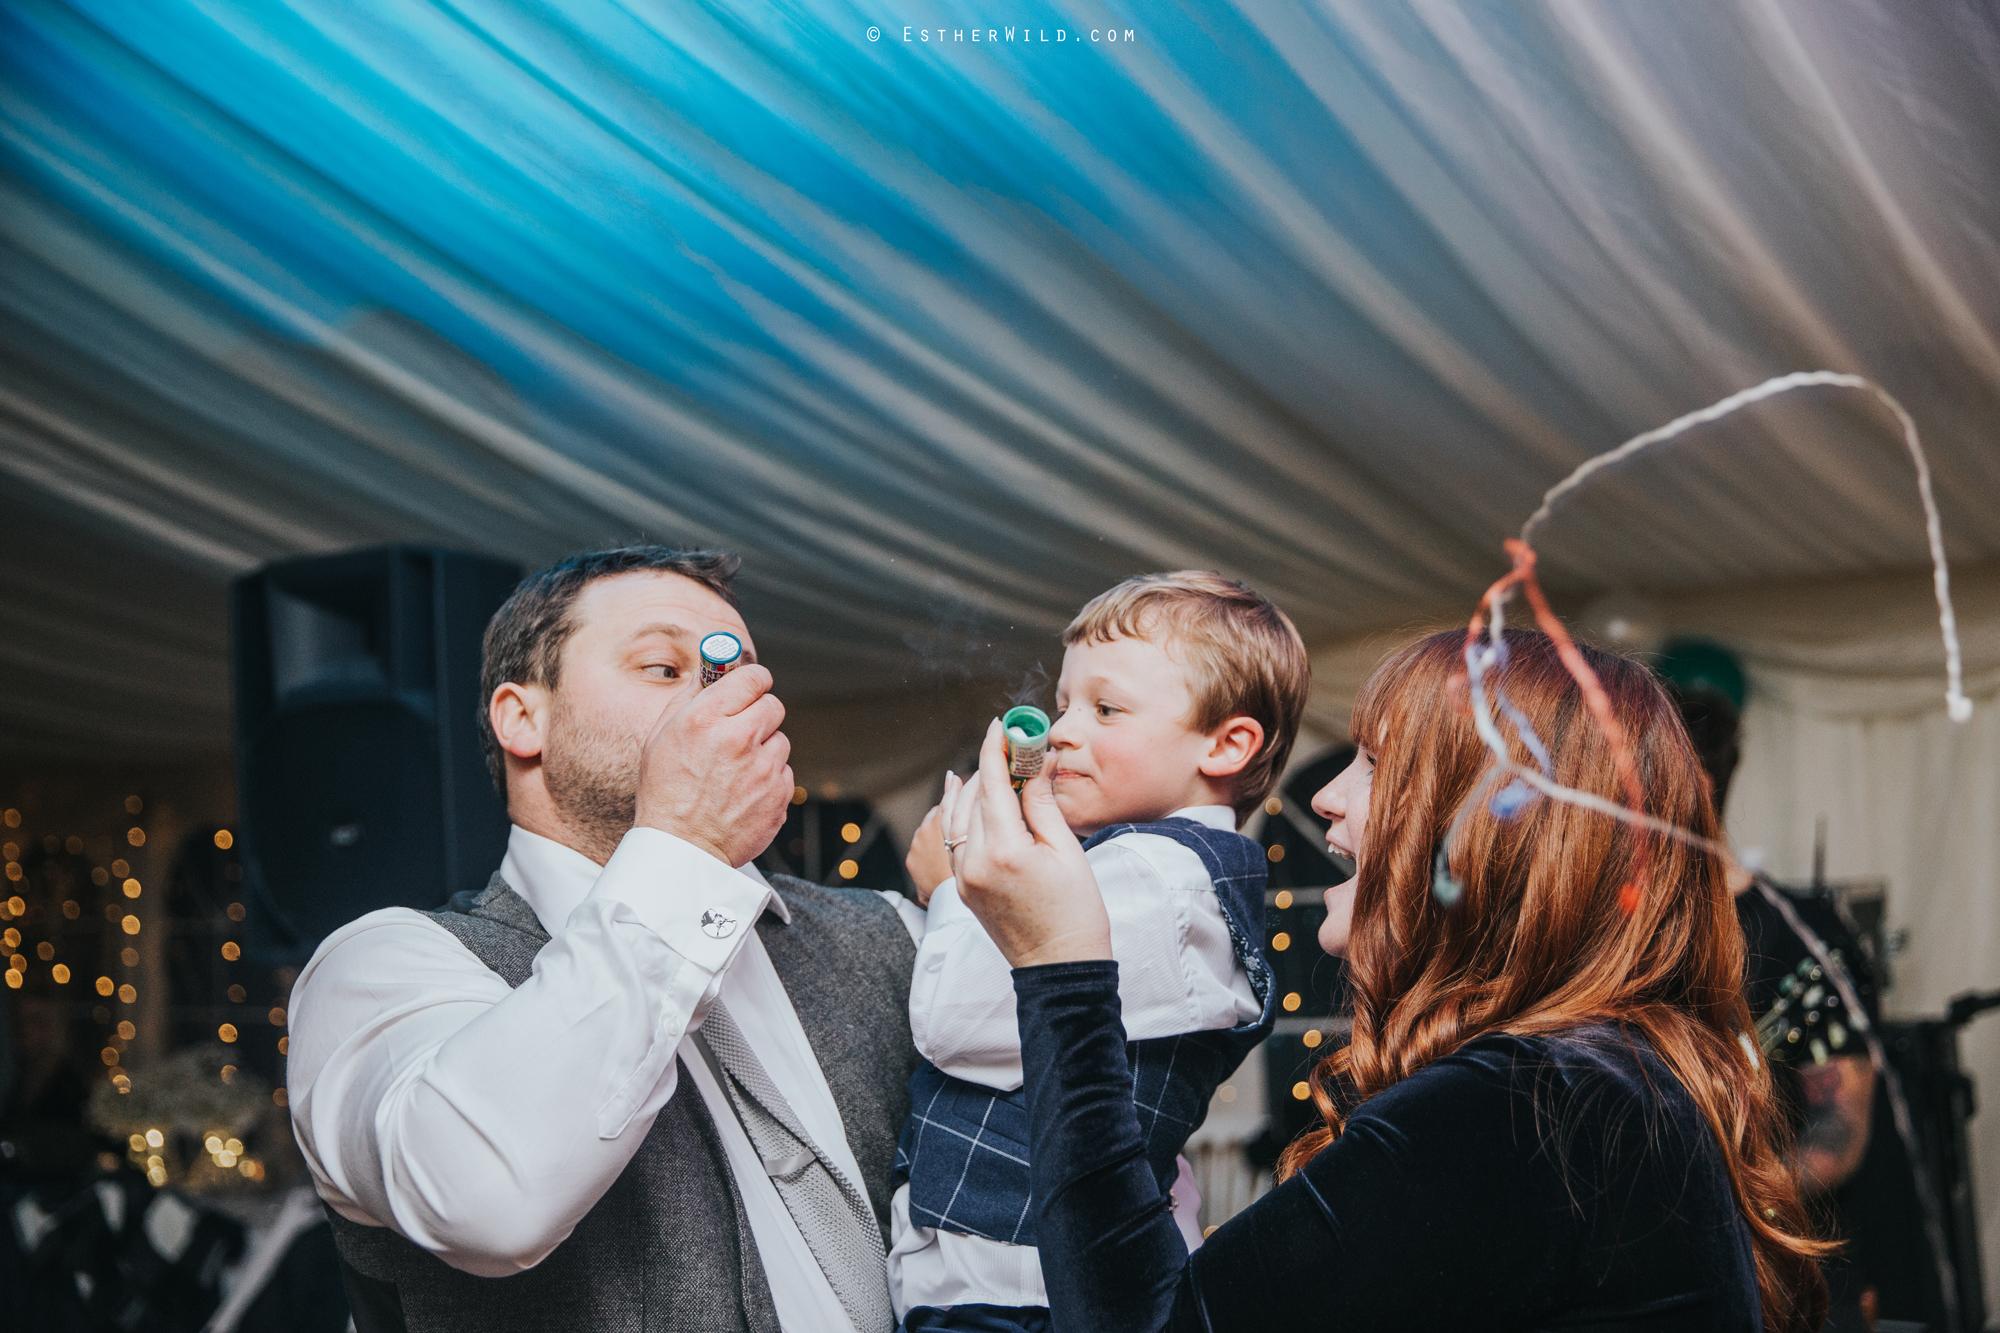 Wedding_Photography_Diss_Gawdy_Hall_Redenhall_Church_Norfolk_Winter_Esther_Wild_Copyright_IMG_2828.jpg